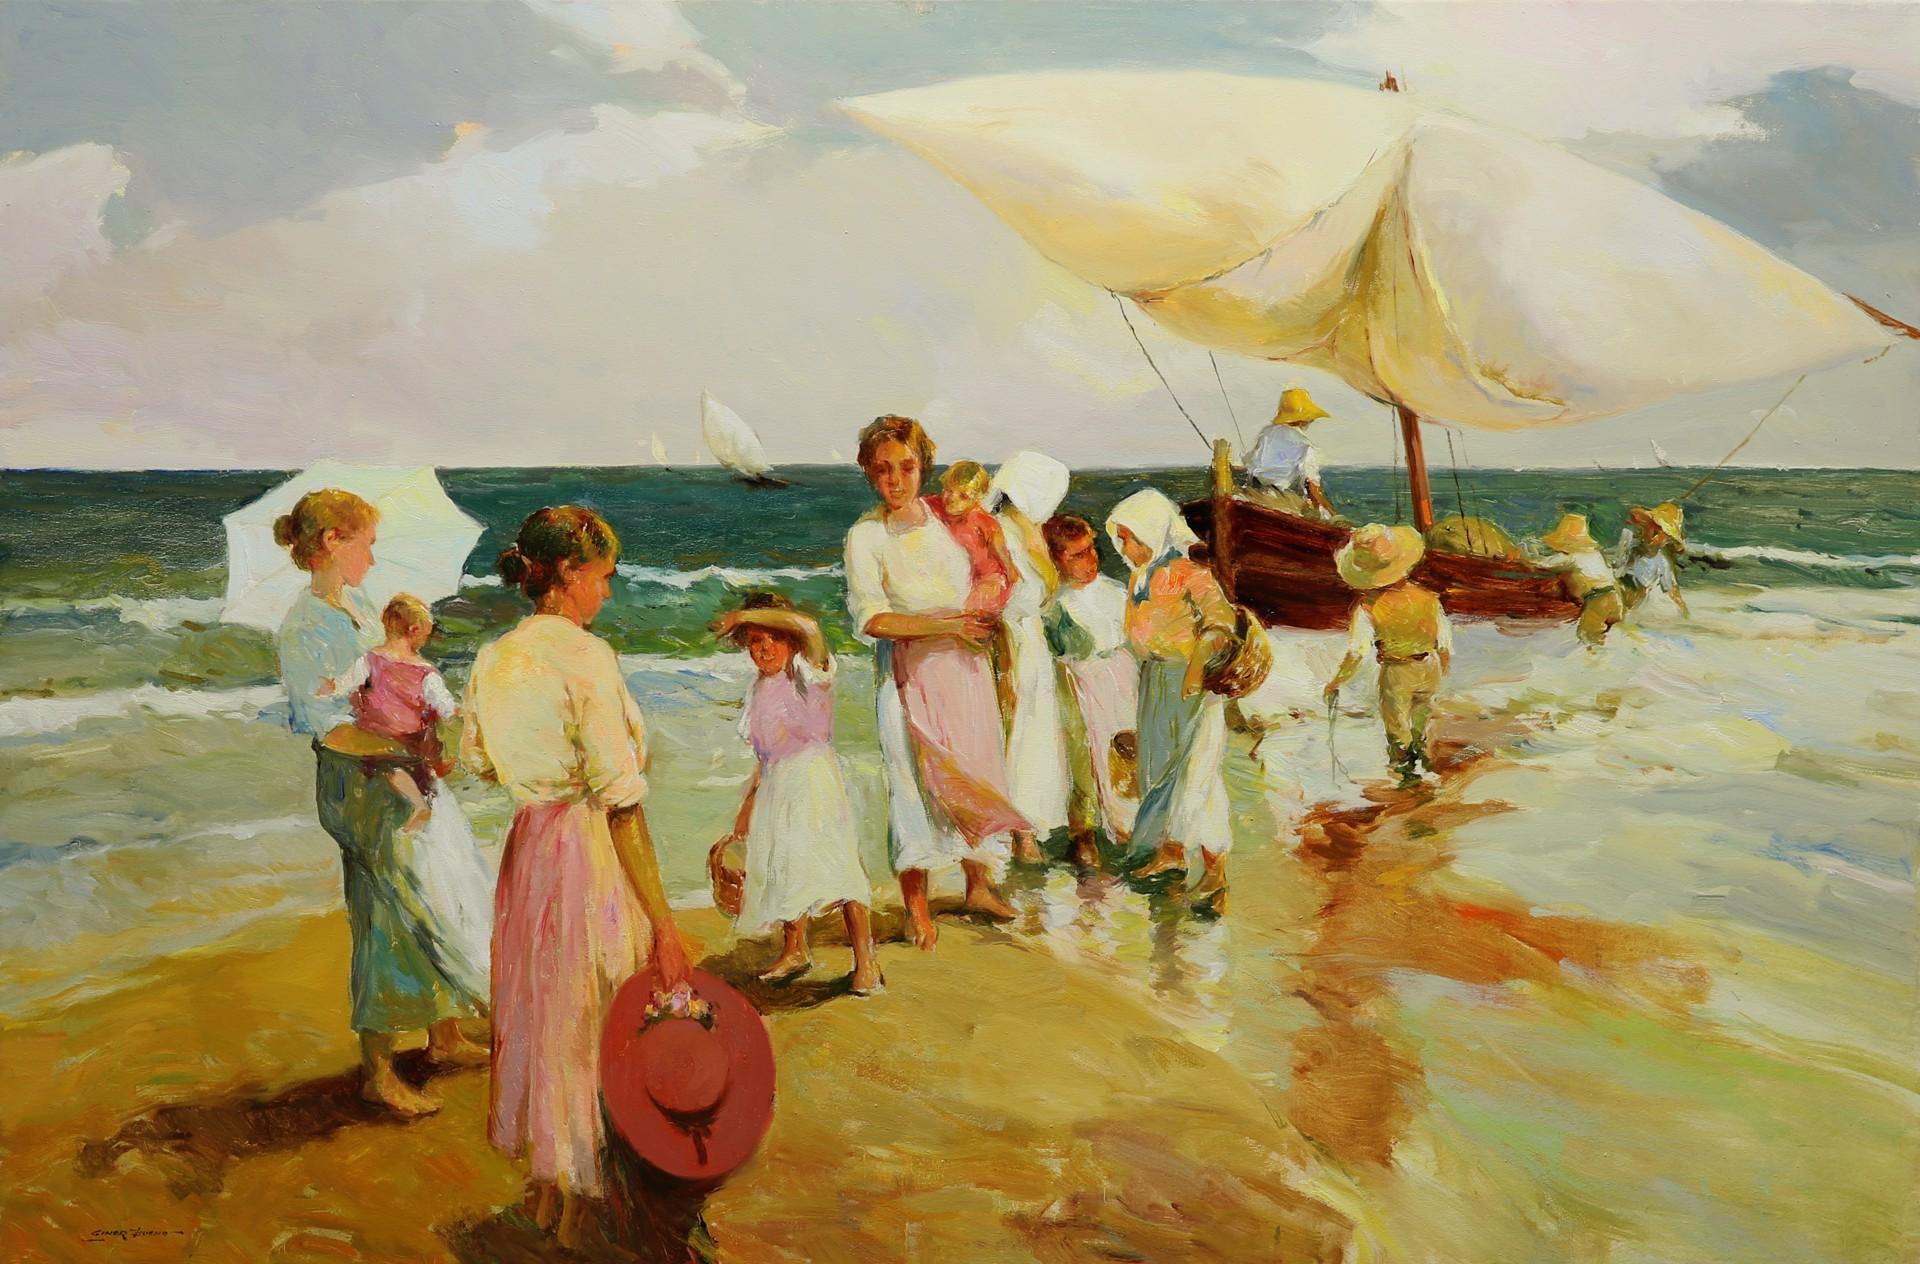 Llegada a la Playa (Arrival at the Beach) by Giner Bueno